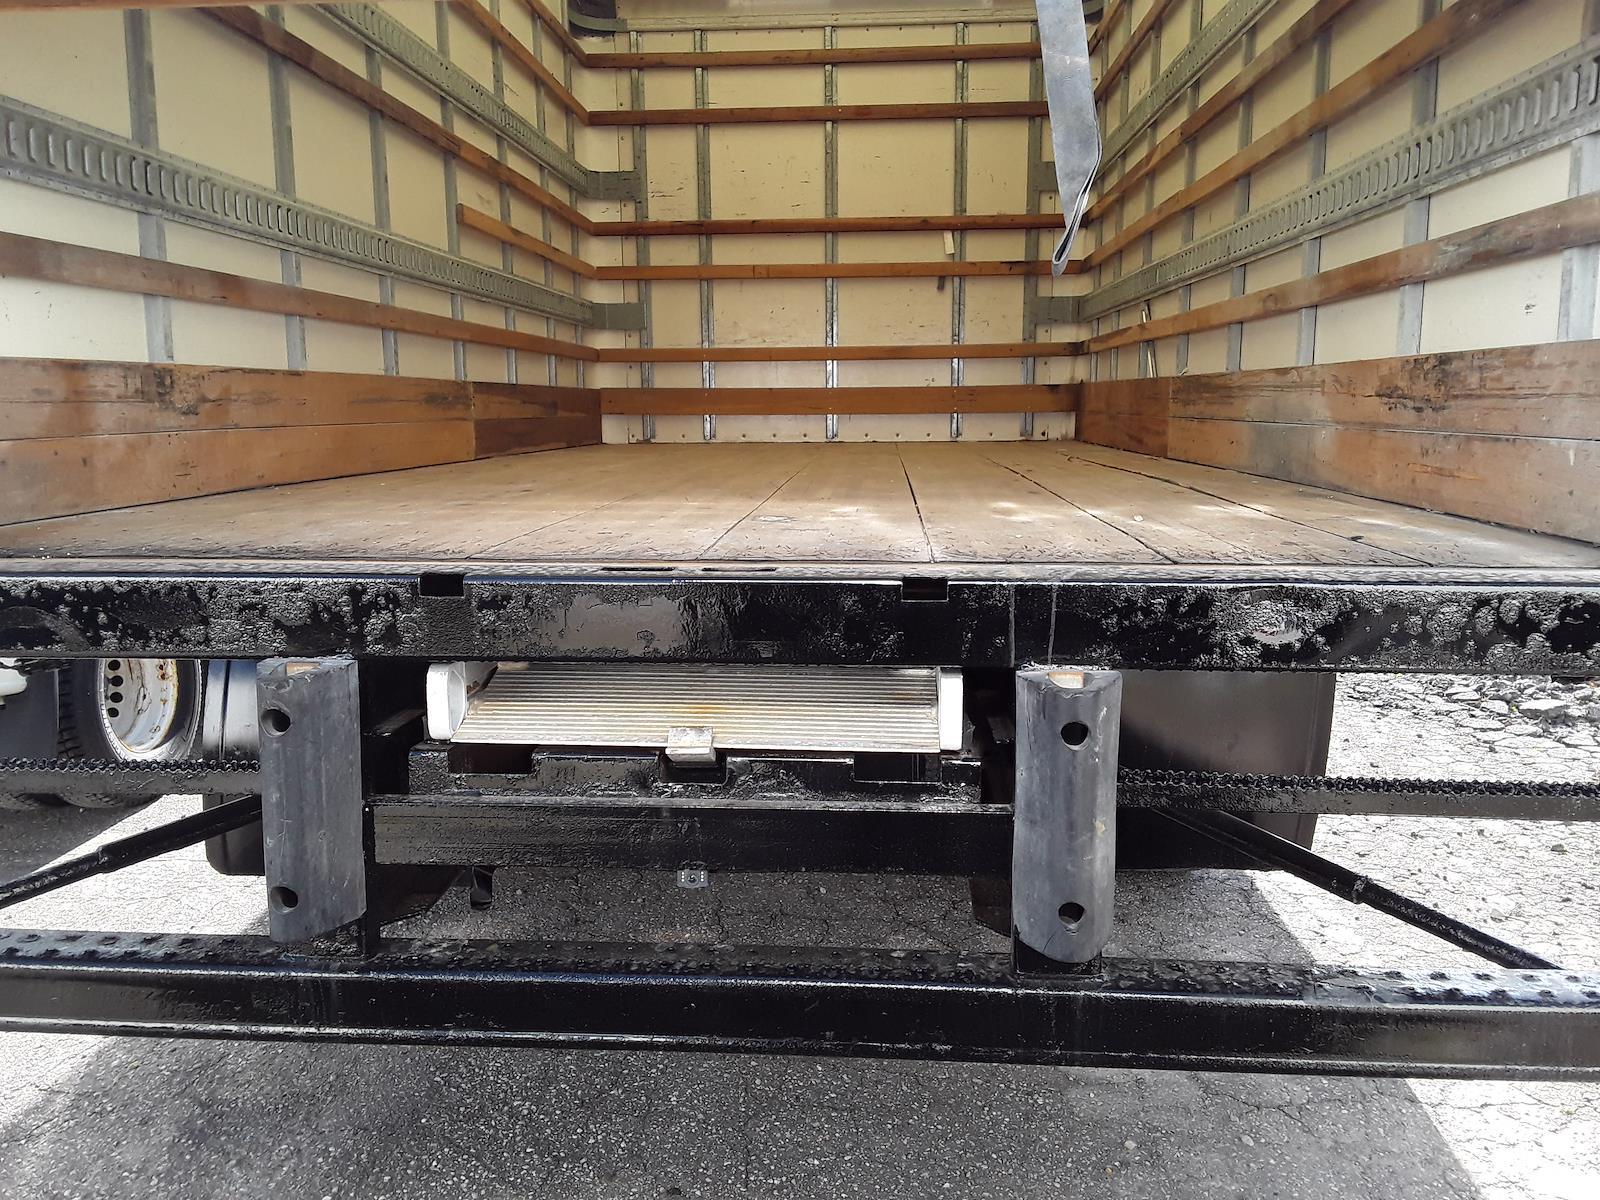 2017 Isuzu NPR-XD Regular Cab 4x2, Dry Freight #684568 - photo 1